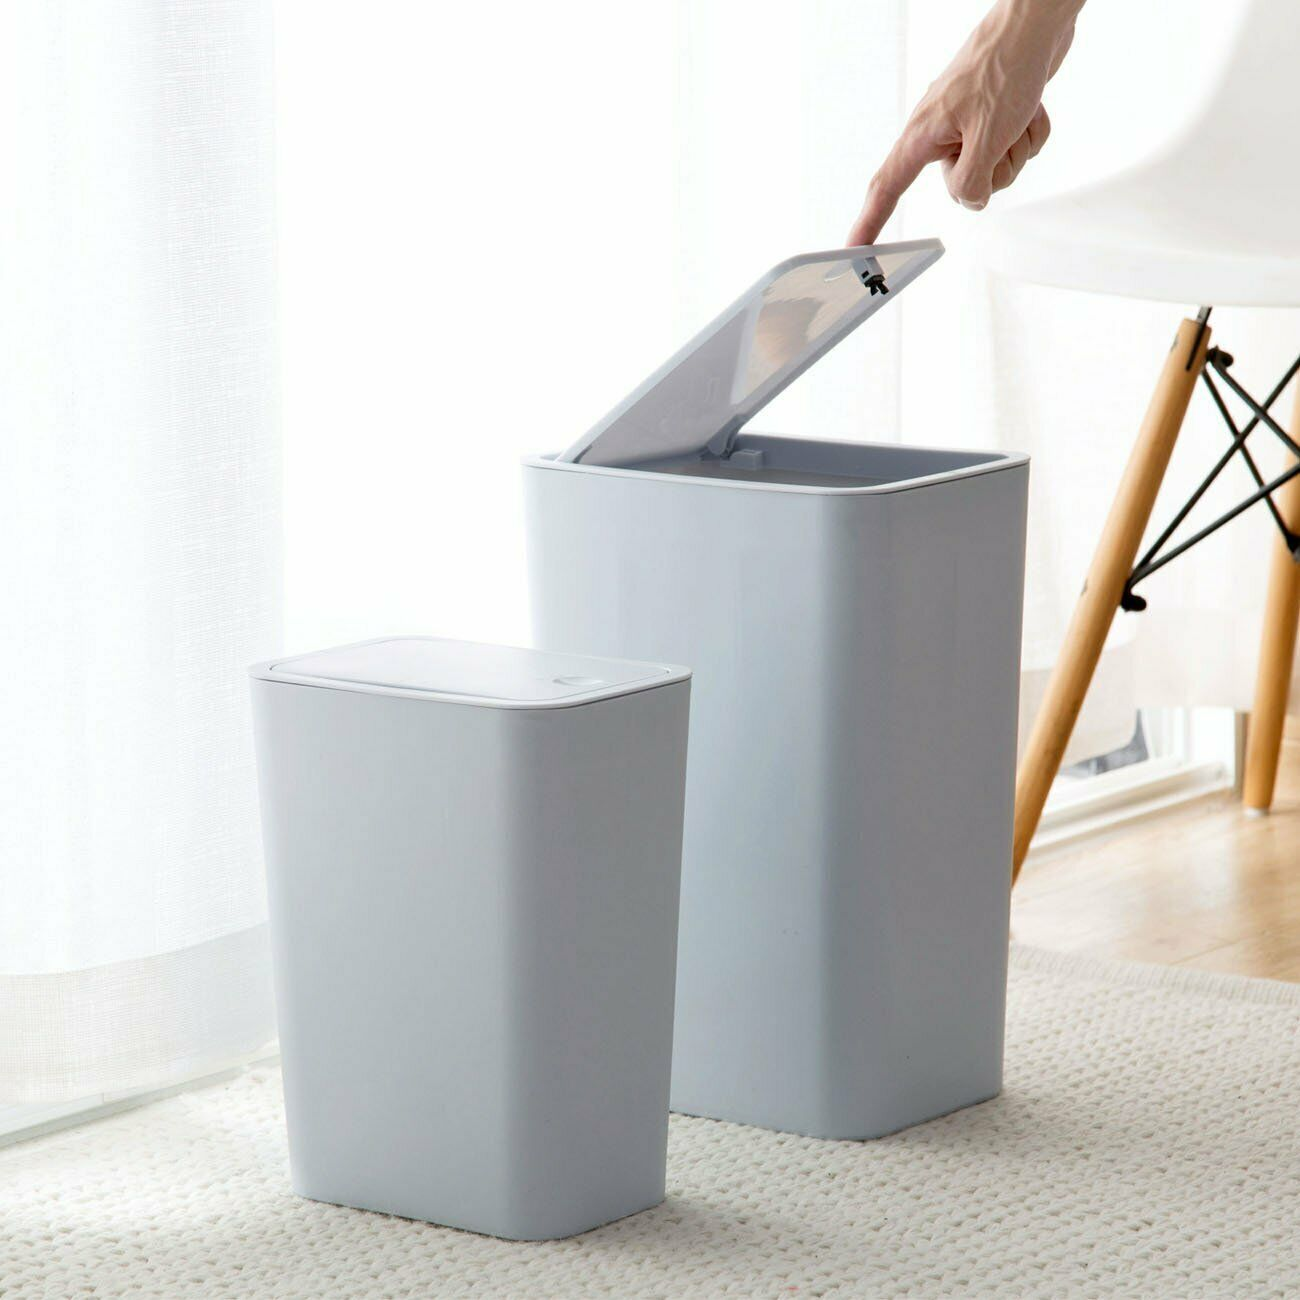 Touch Lid Slim Trash Can Garbage Rubbish Bin Wastebasket Toilet